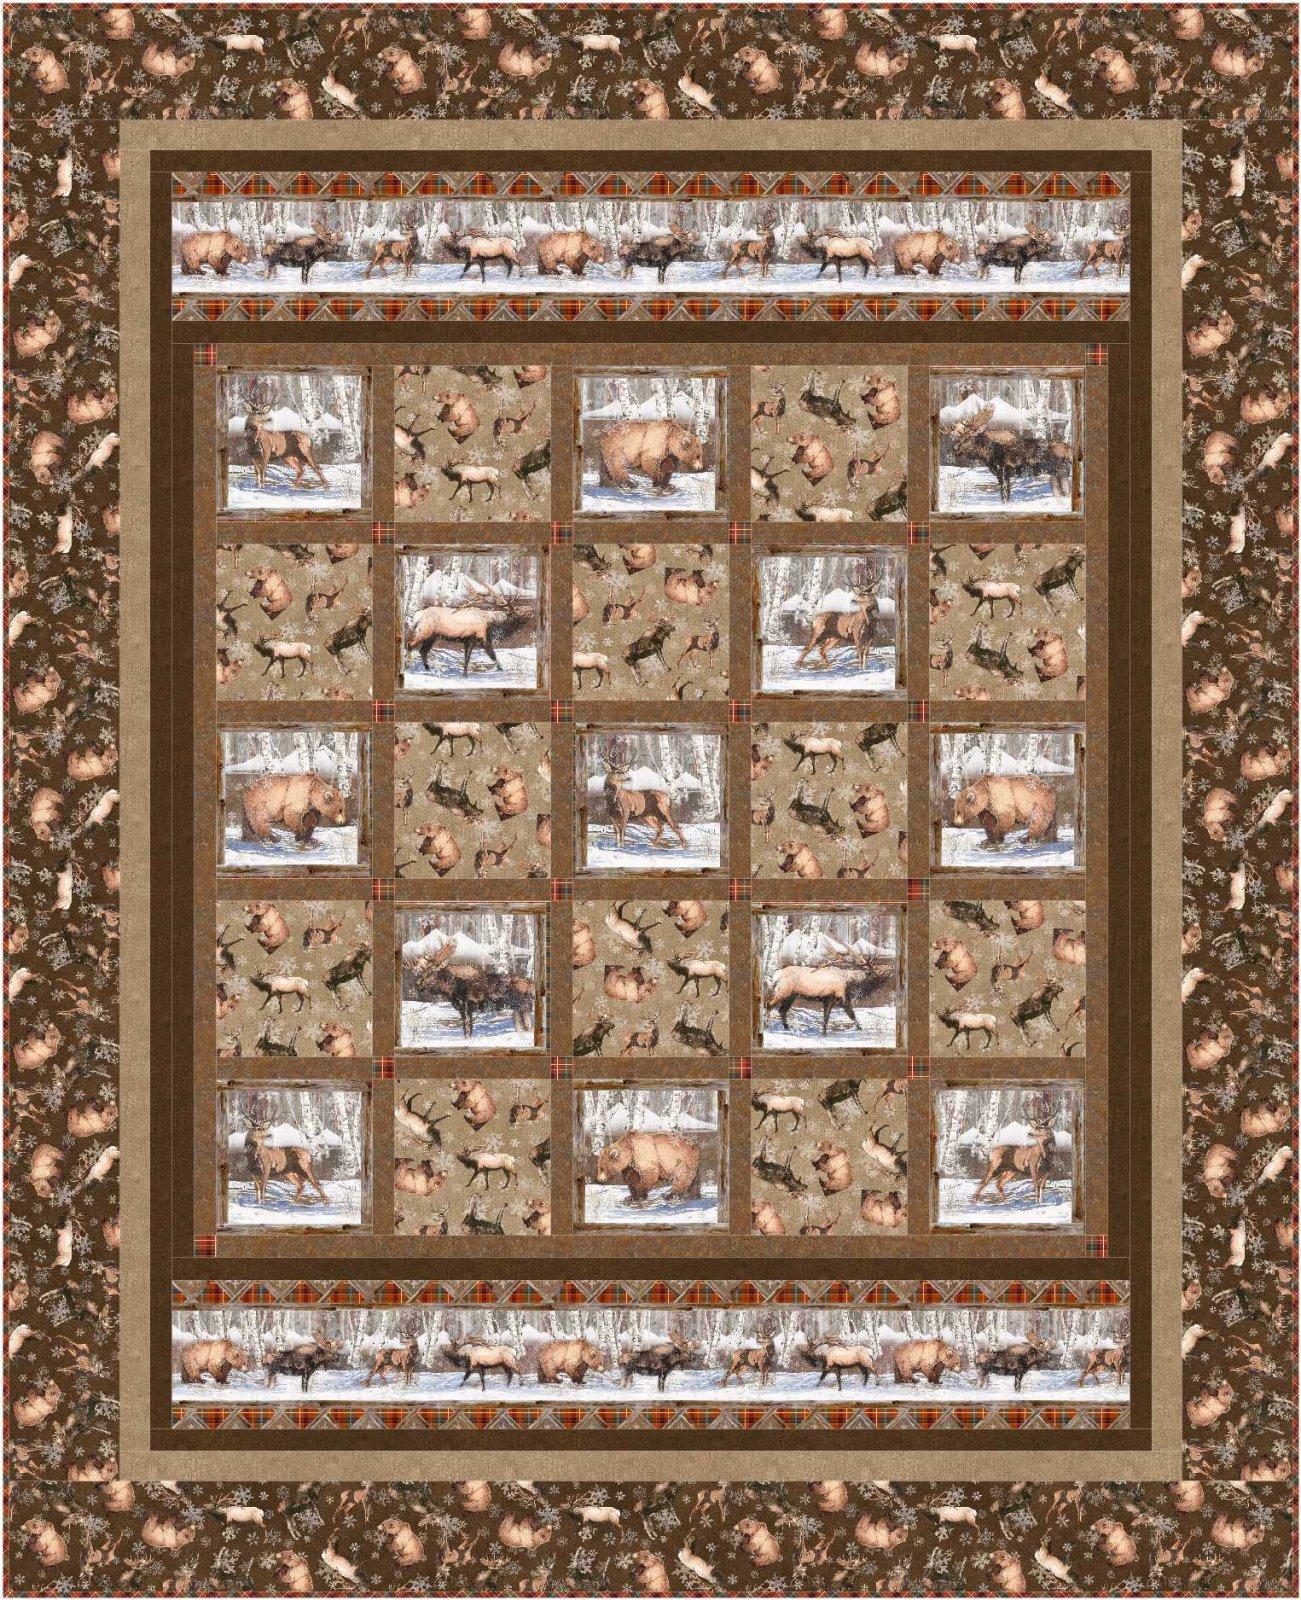 Winter Frolic quilt pattern - downloadable